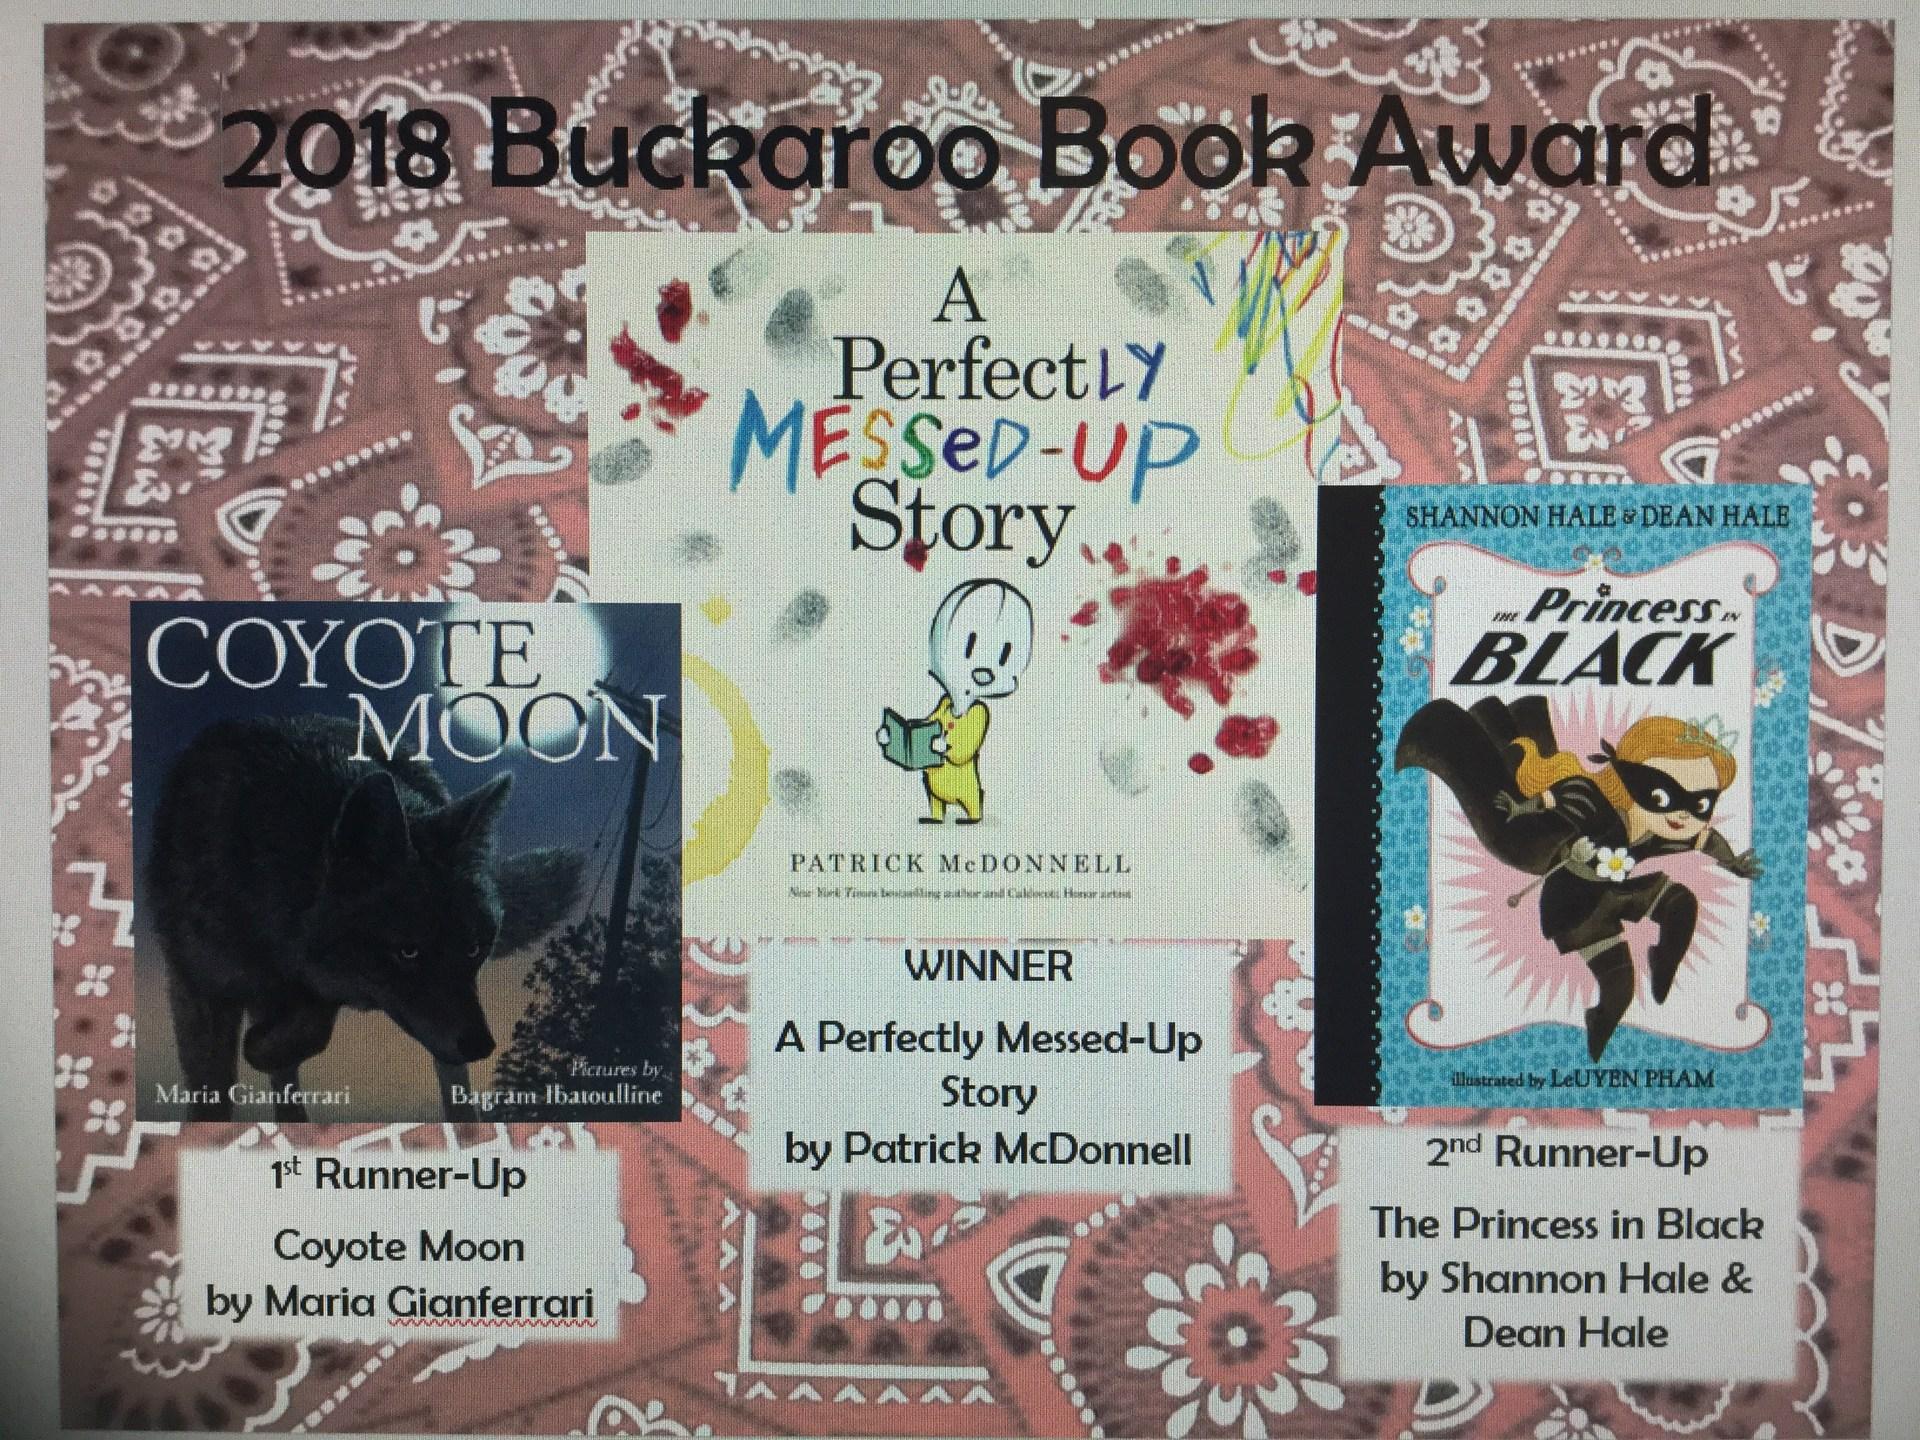 Top 3 Buckaroo book winners